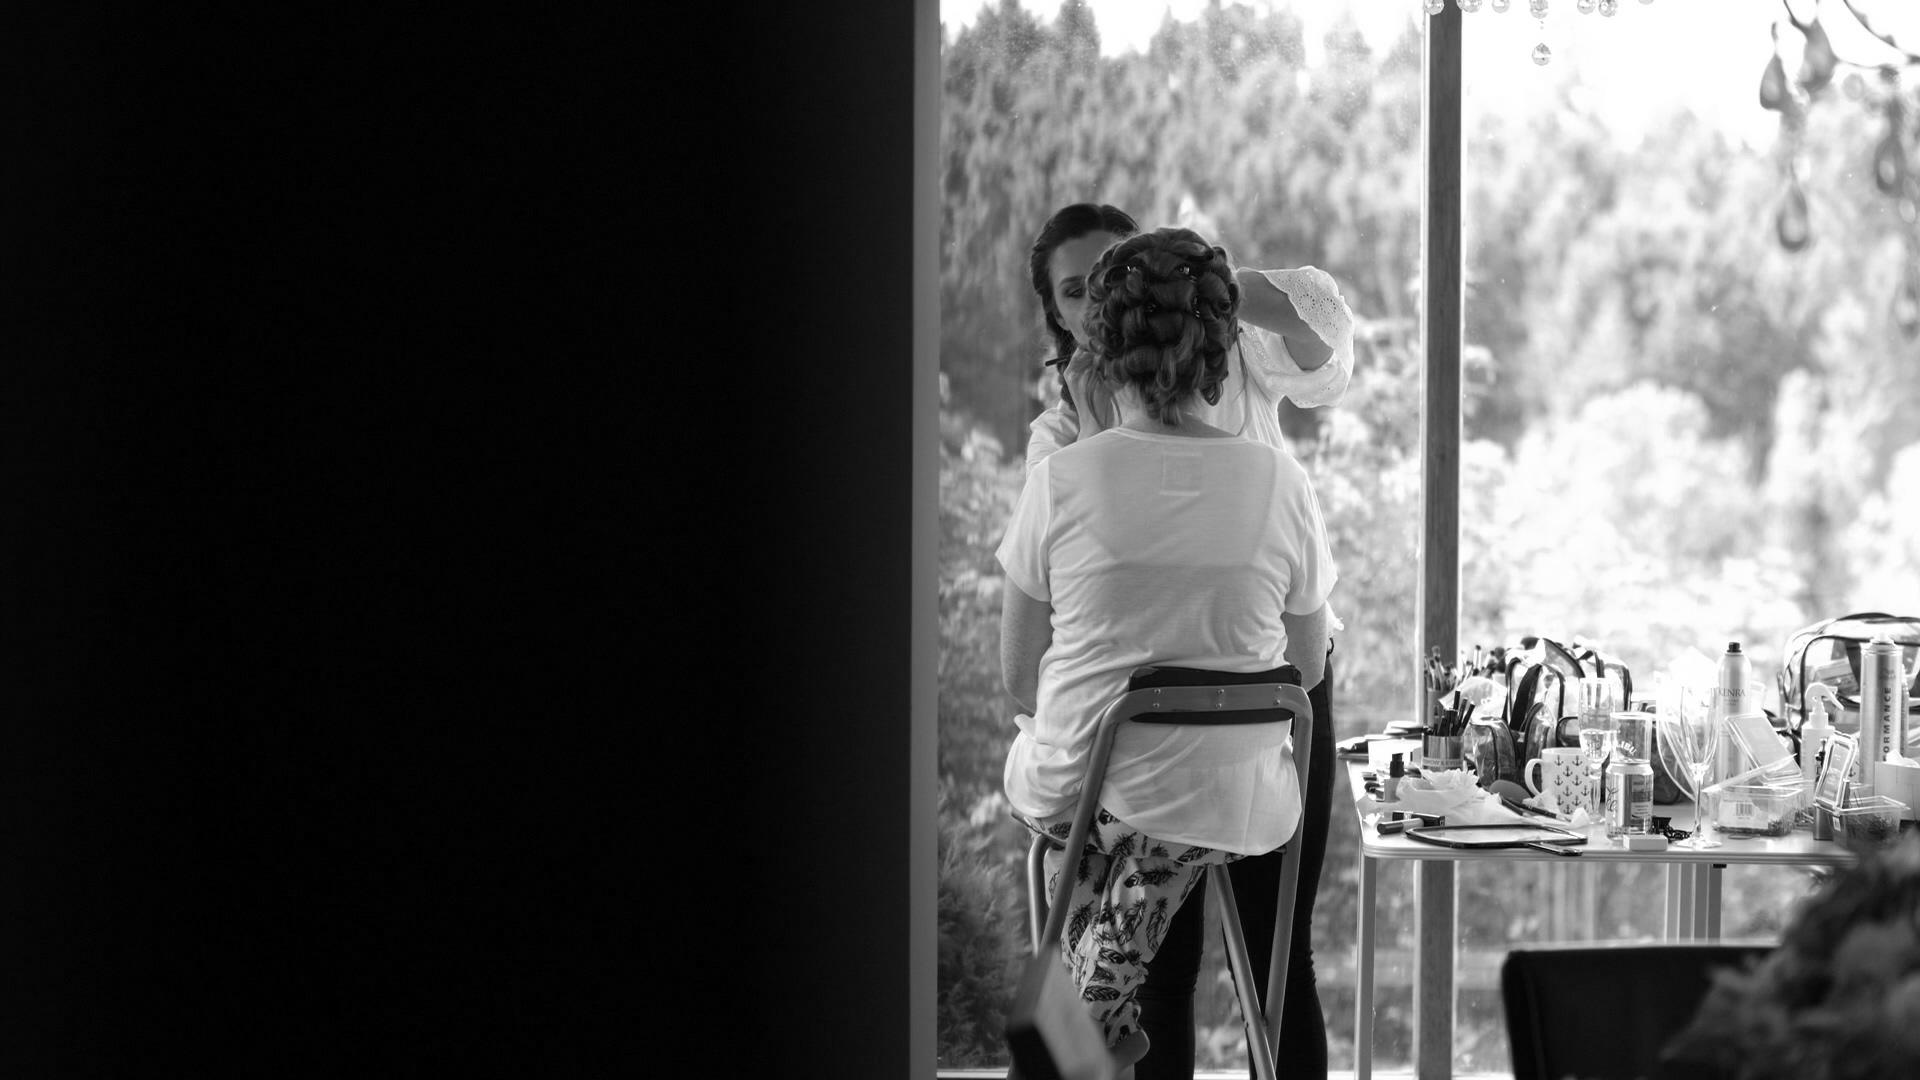 ASWANLEY-SUMMER-WEDDING (02).jpg